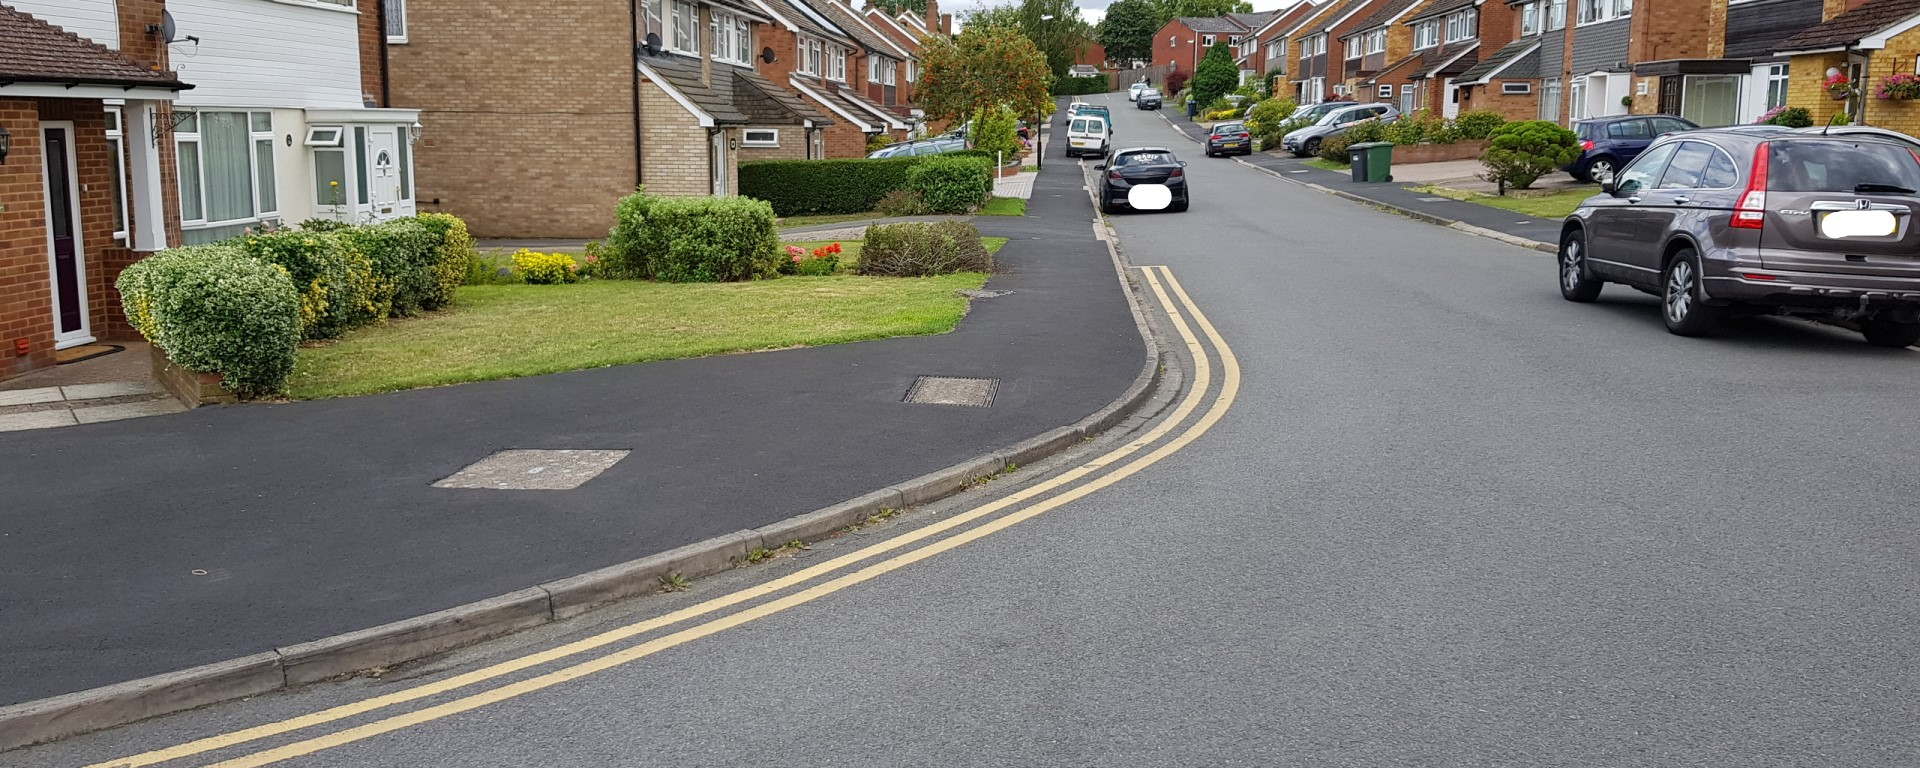 pavement-parking-2